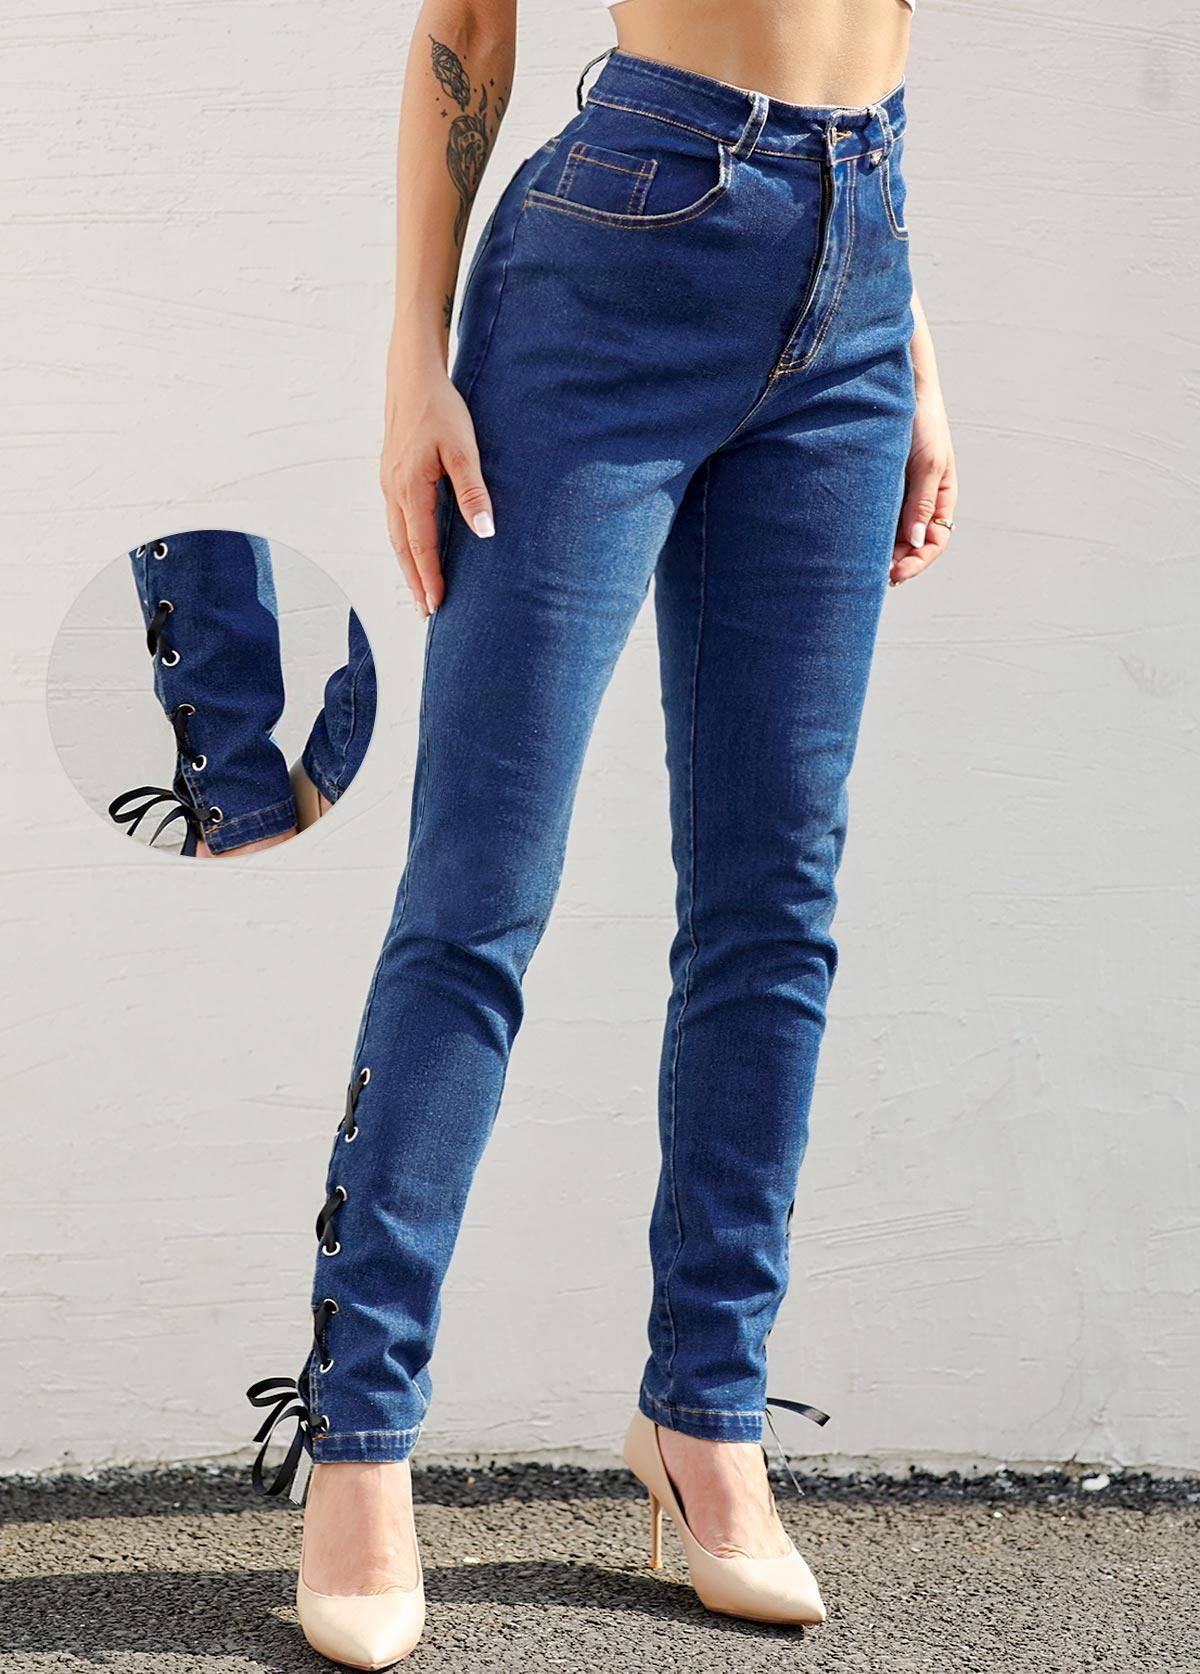 ROTITA High Waist Lace Up Denim Blue Jeans